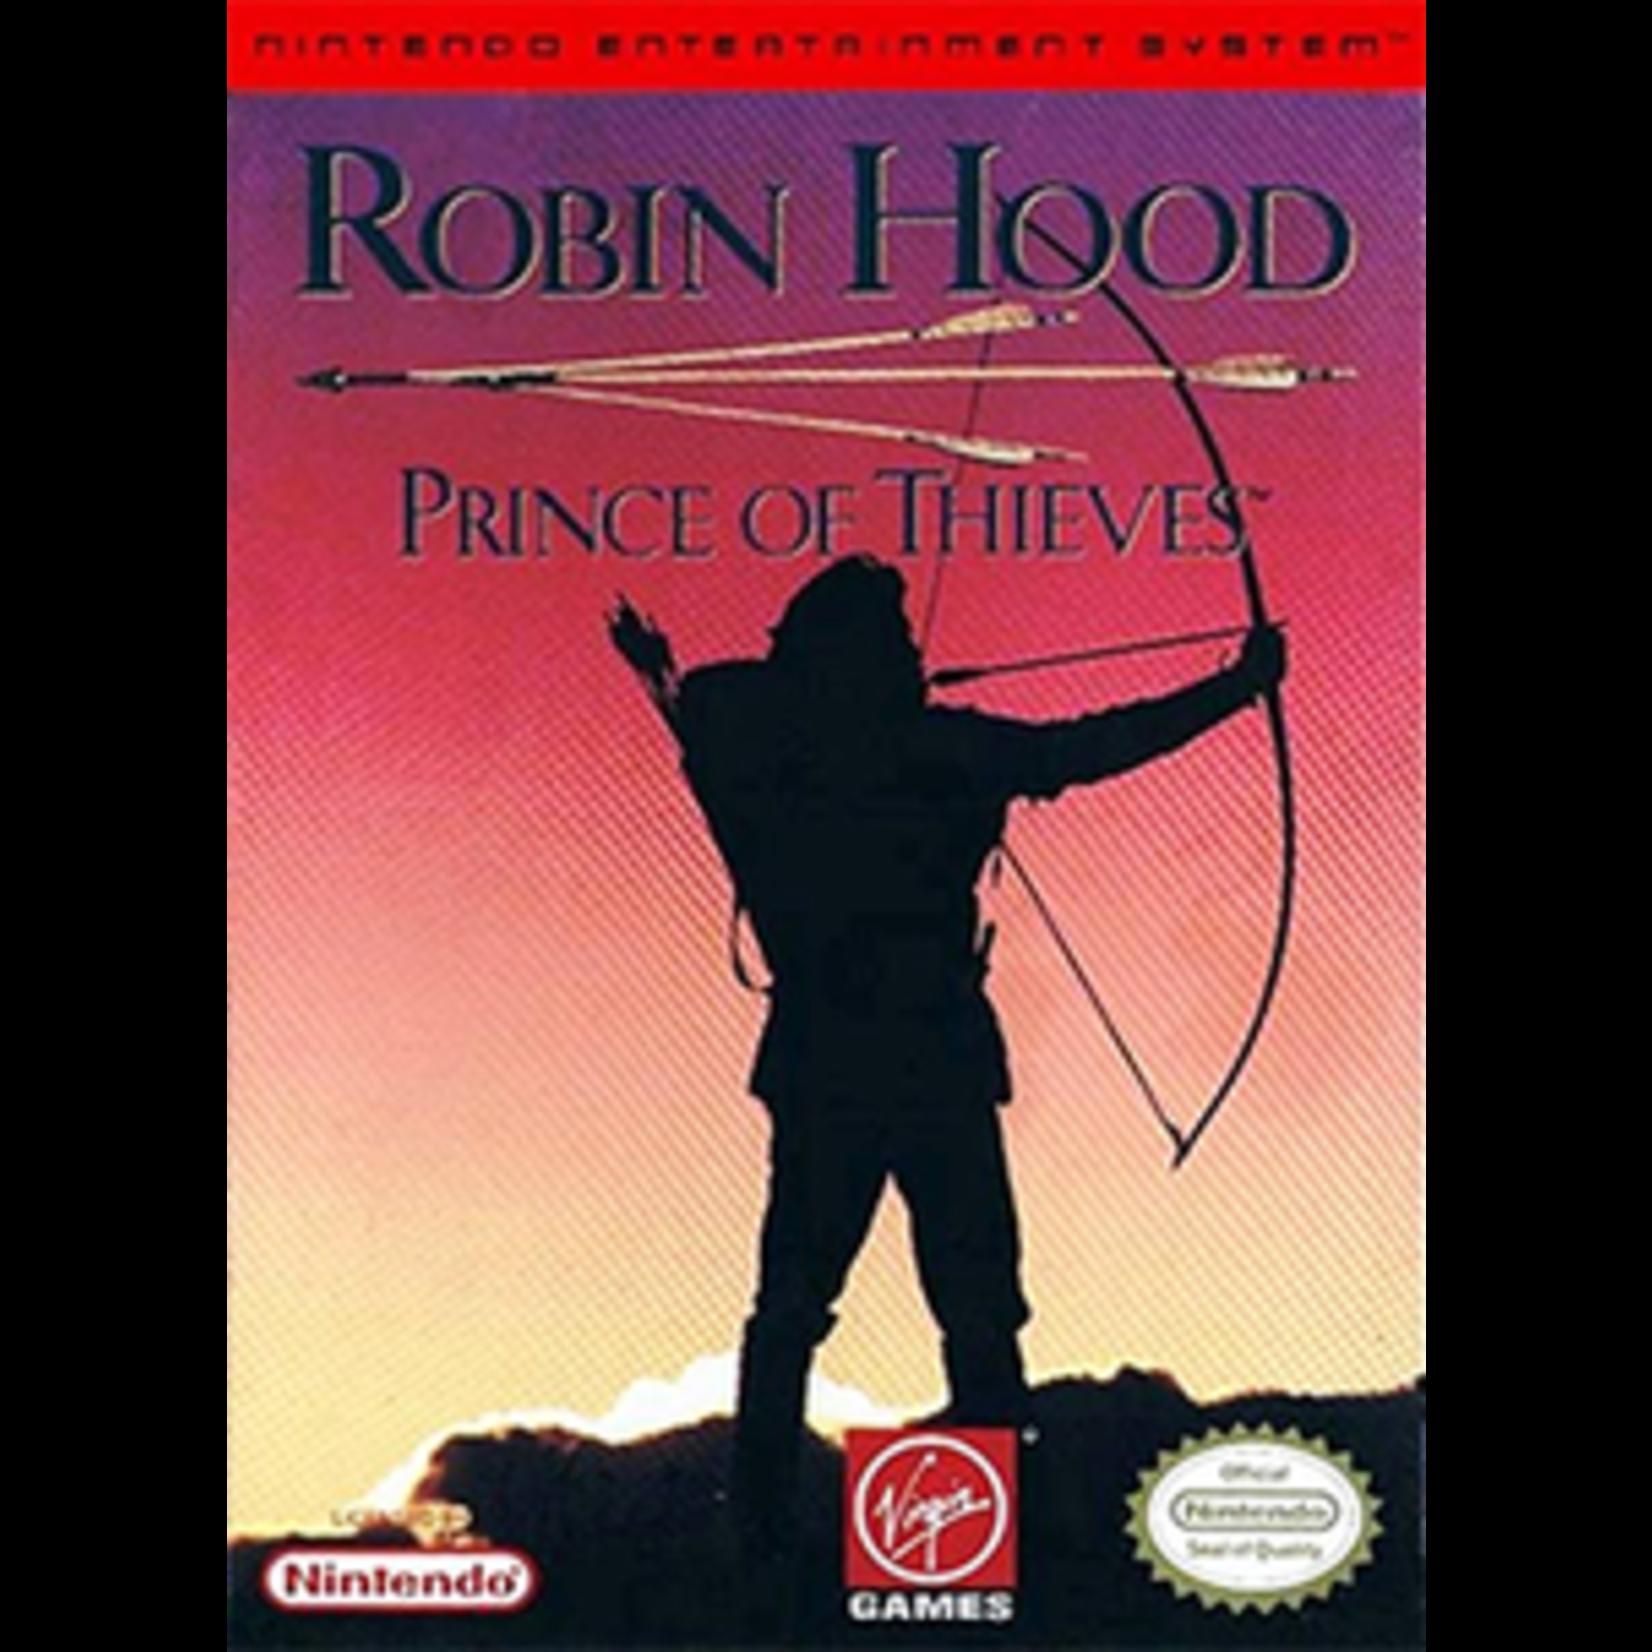 NESU-Robin Hood Prince Of Thieves (Boxed)